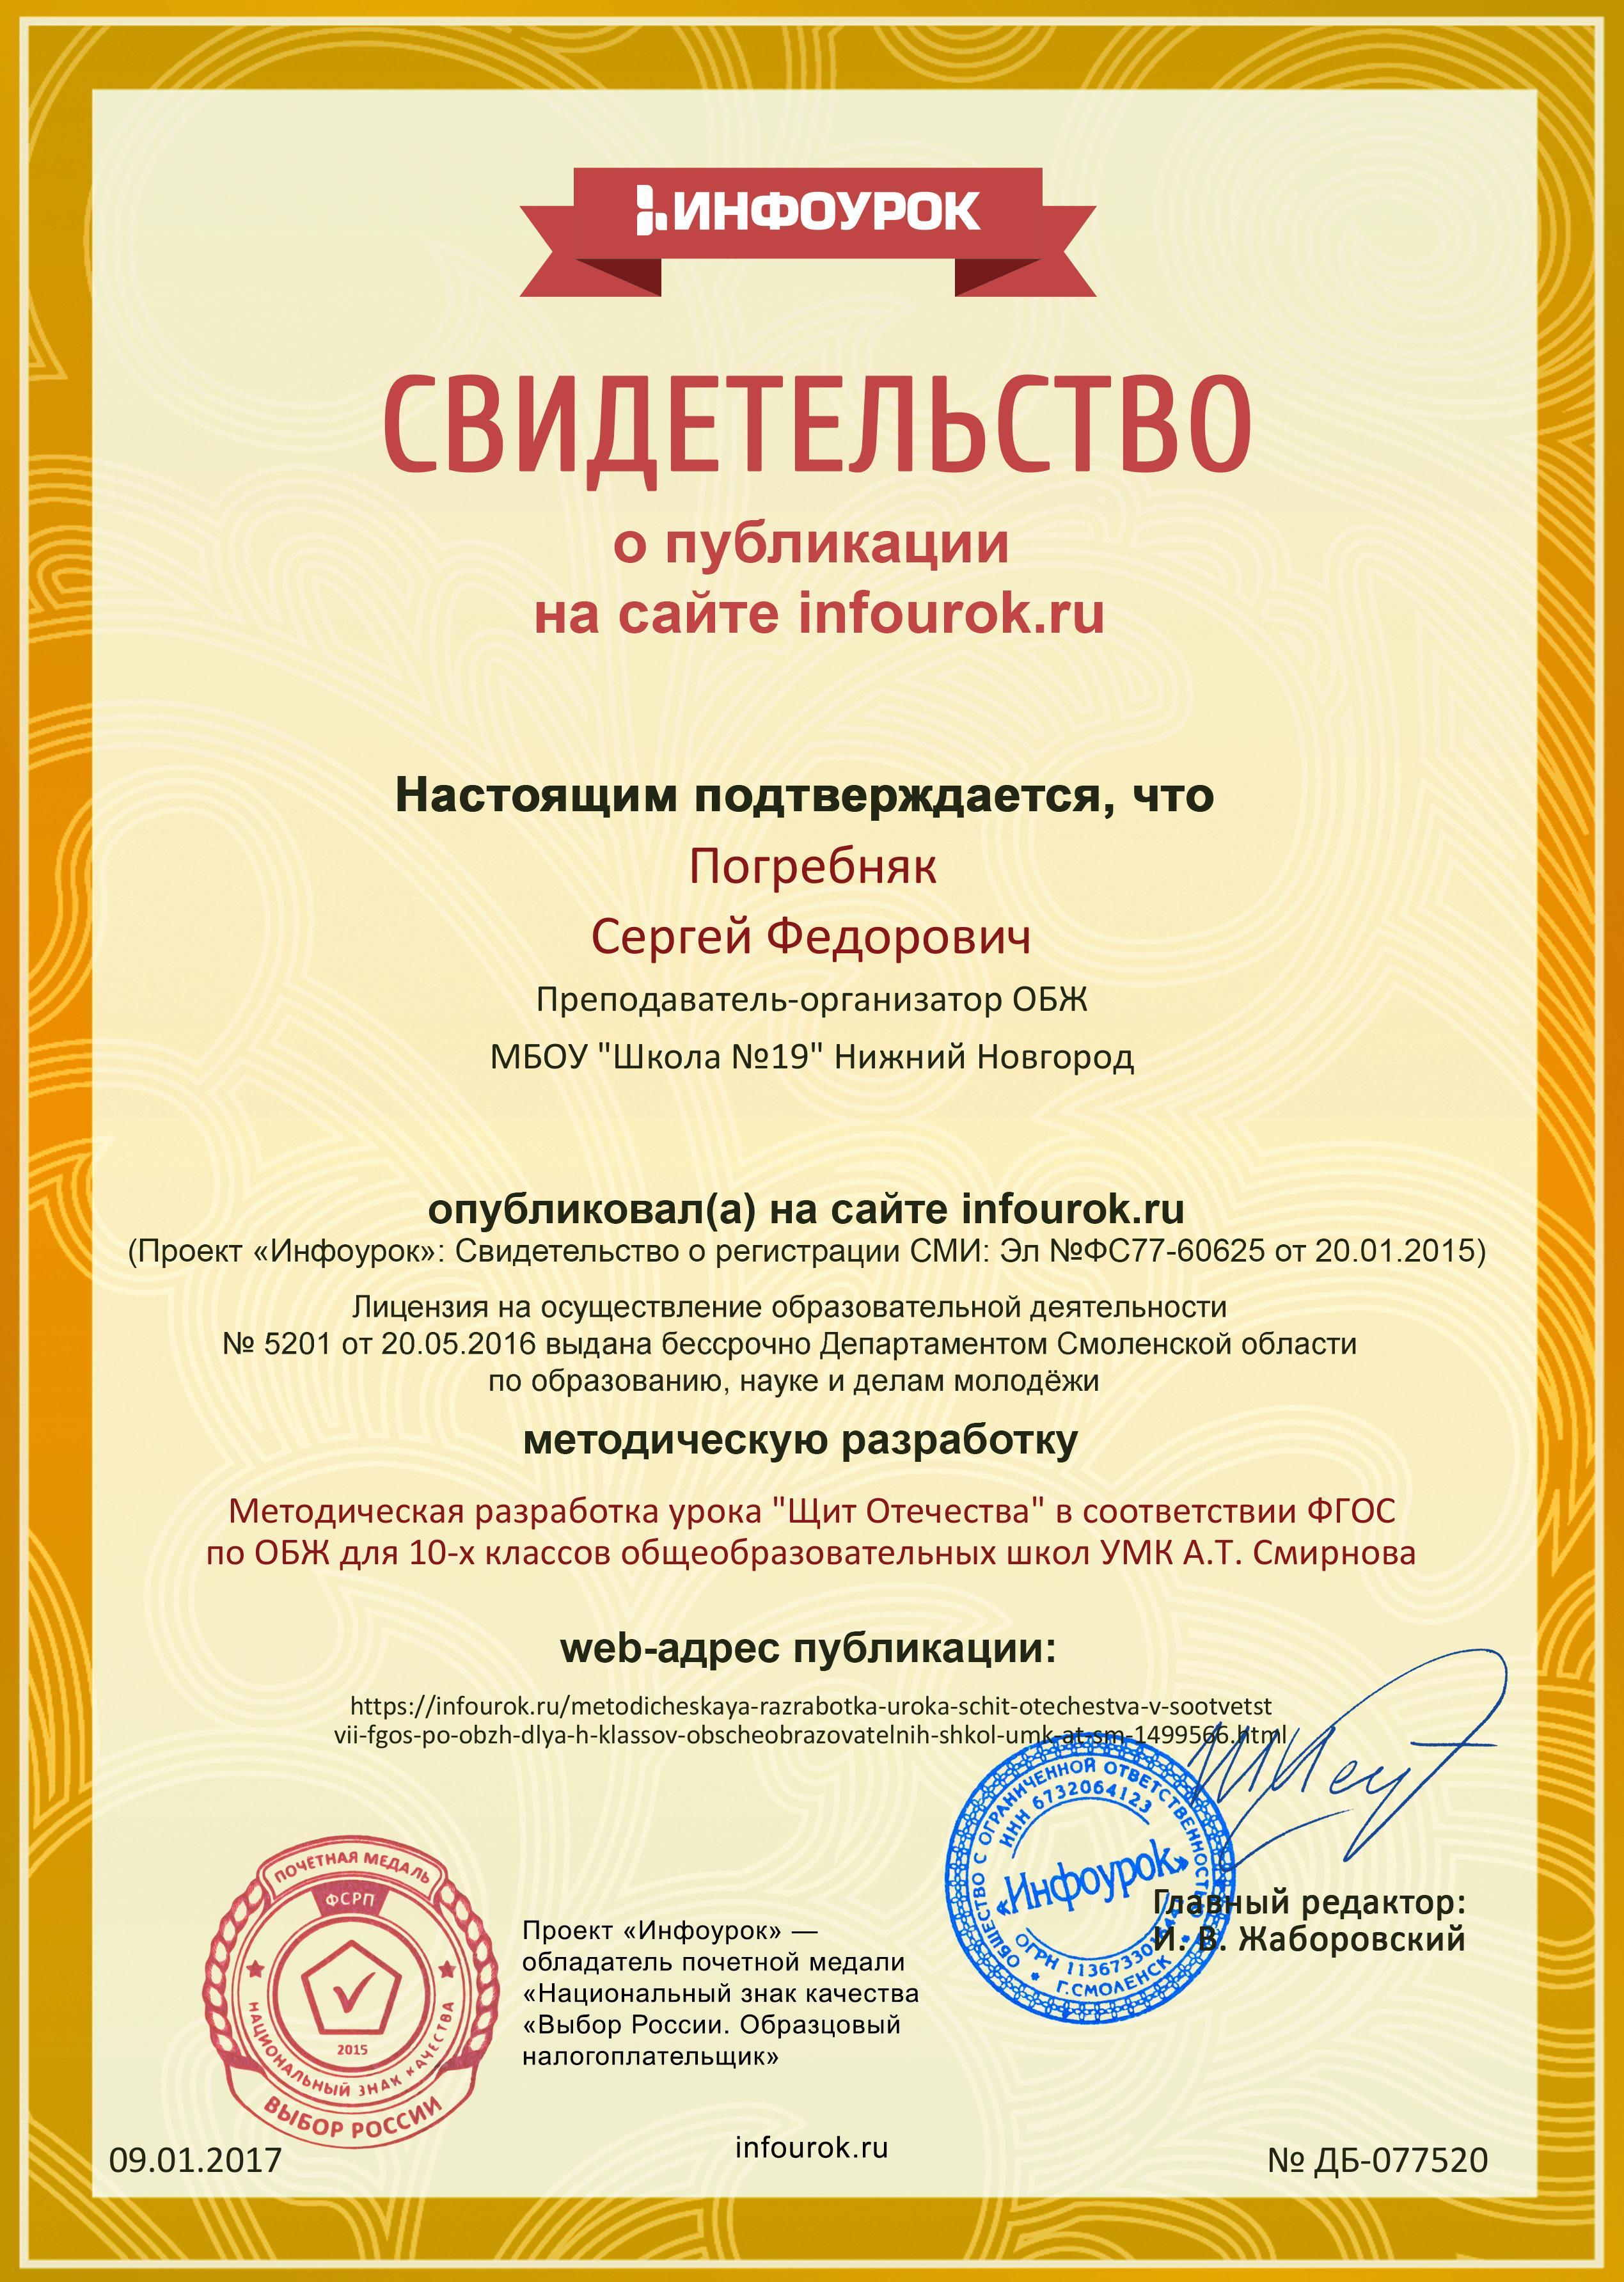 Сертификат проекта infourok.ru № ДБ-077520.jpg